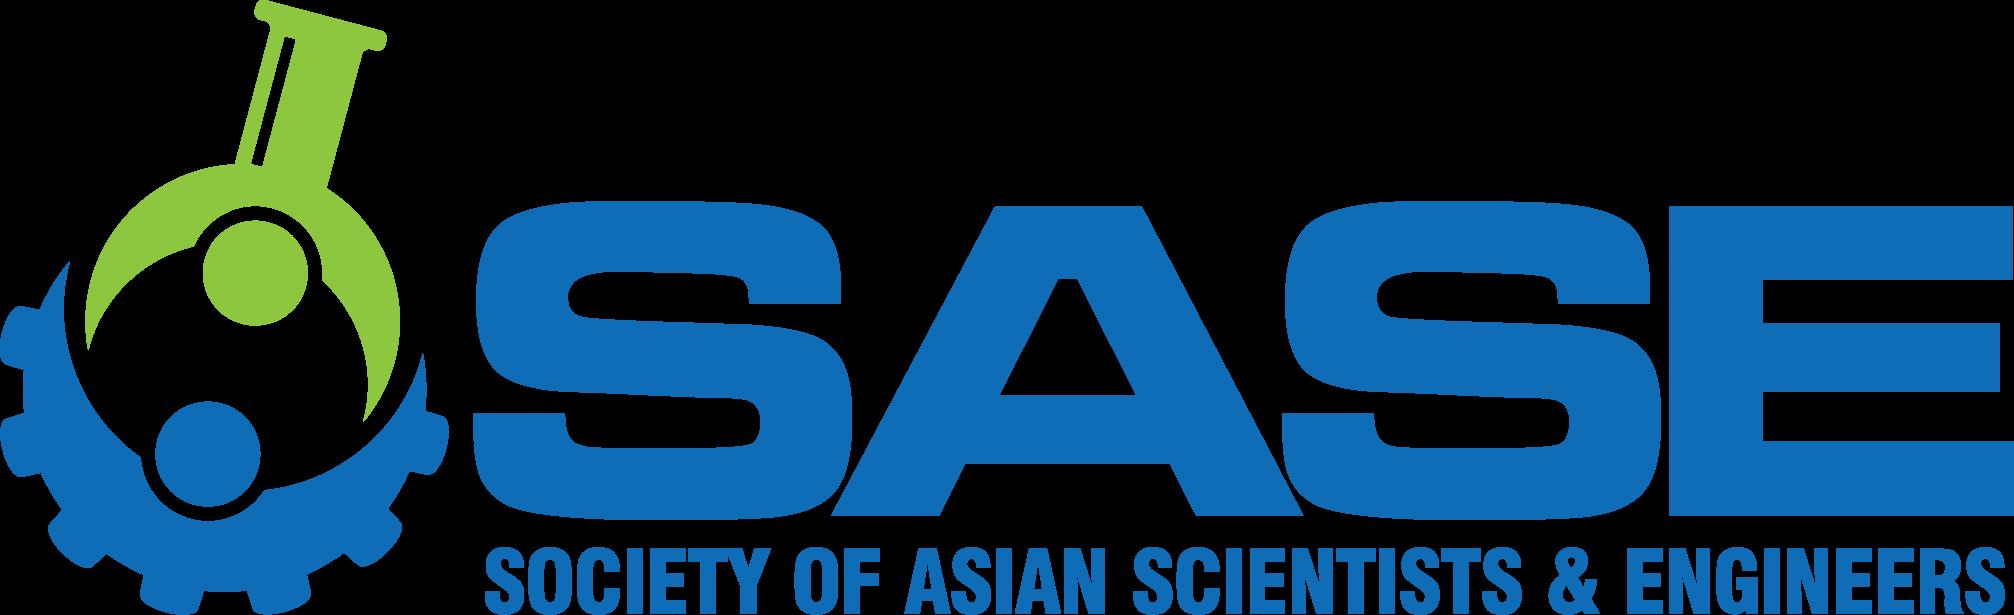 sase-logo-2-color-side-plus-text